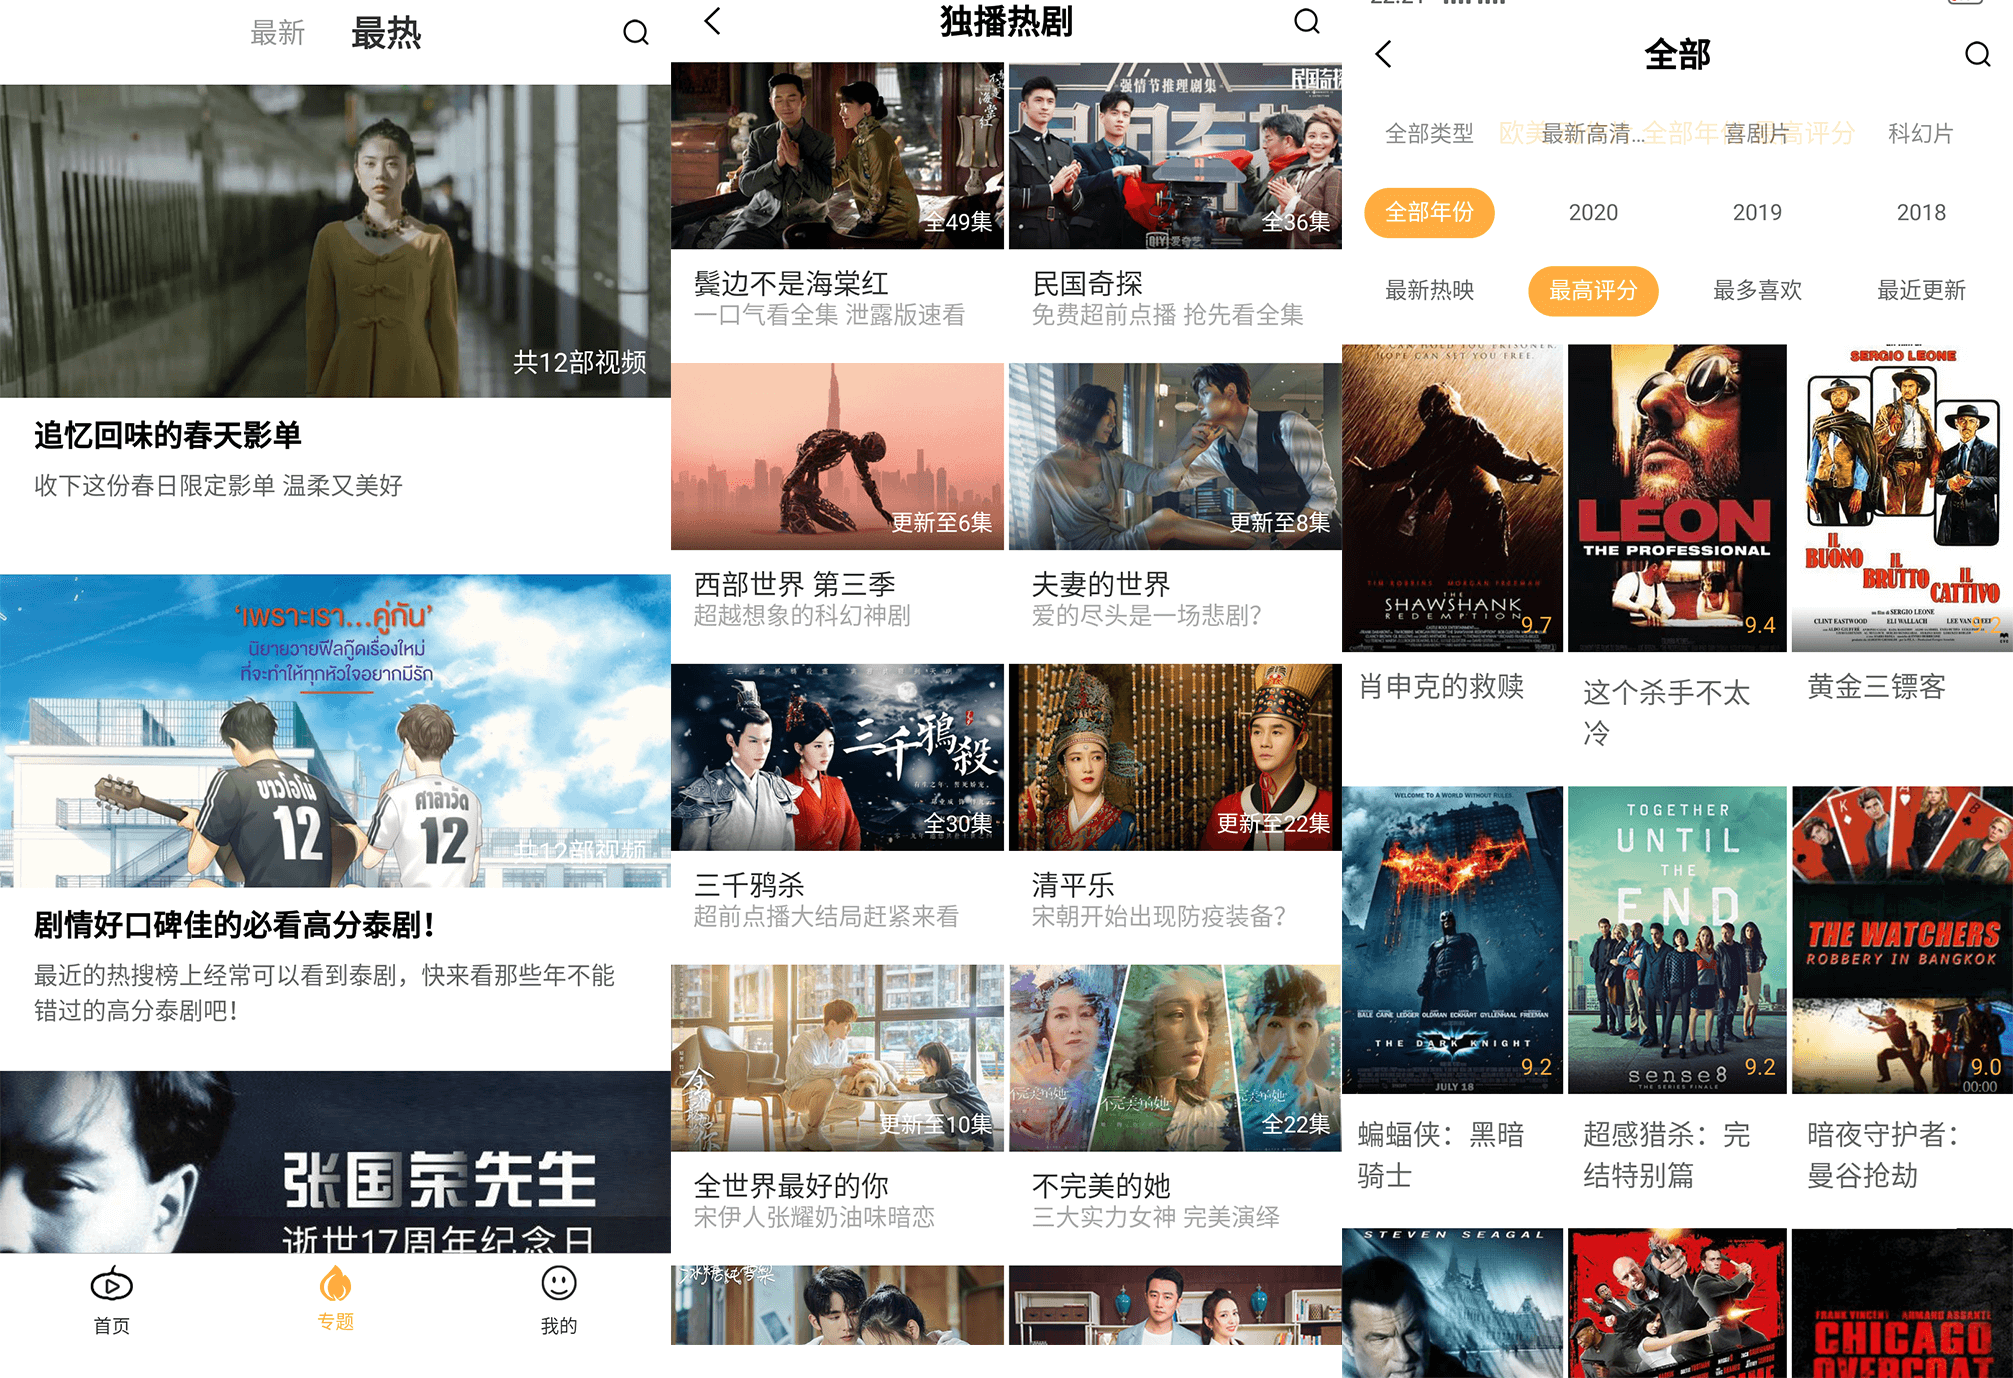 [ Android视频软件 ] 南瓜影视_1.3.7APP 免费百万高清电影任你选